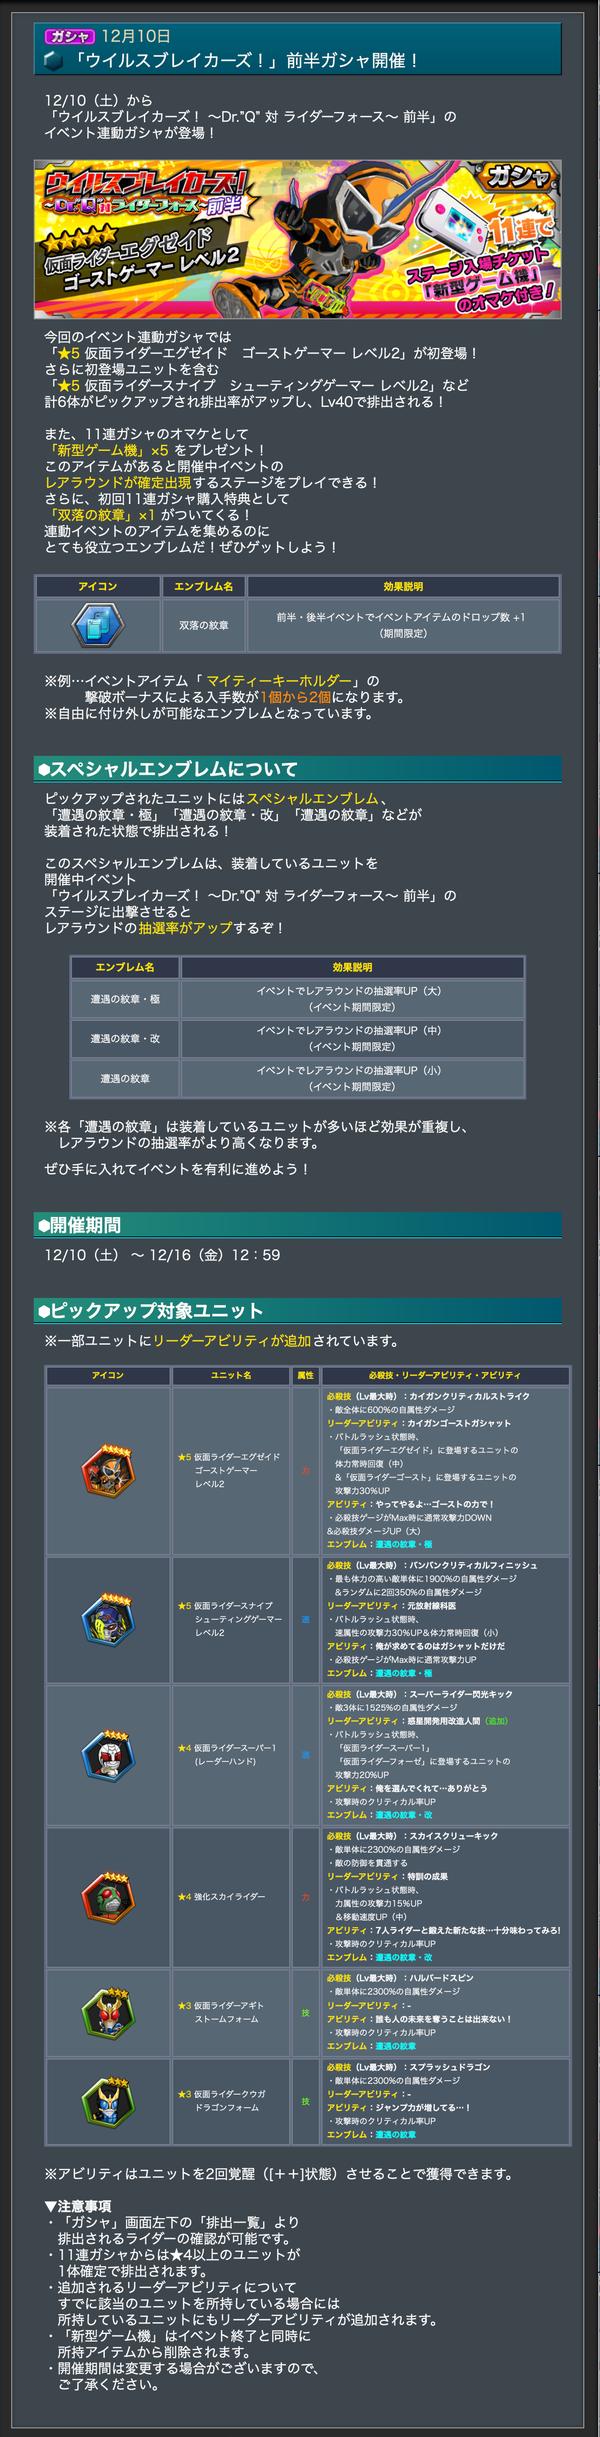 f:id:ich-ichi:20161212165752p:plain